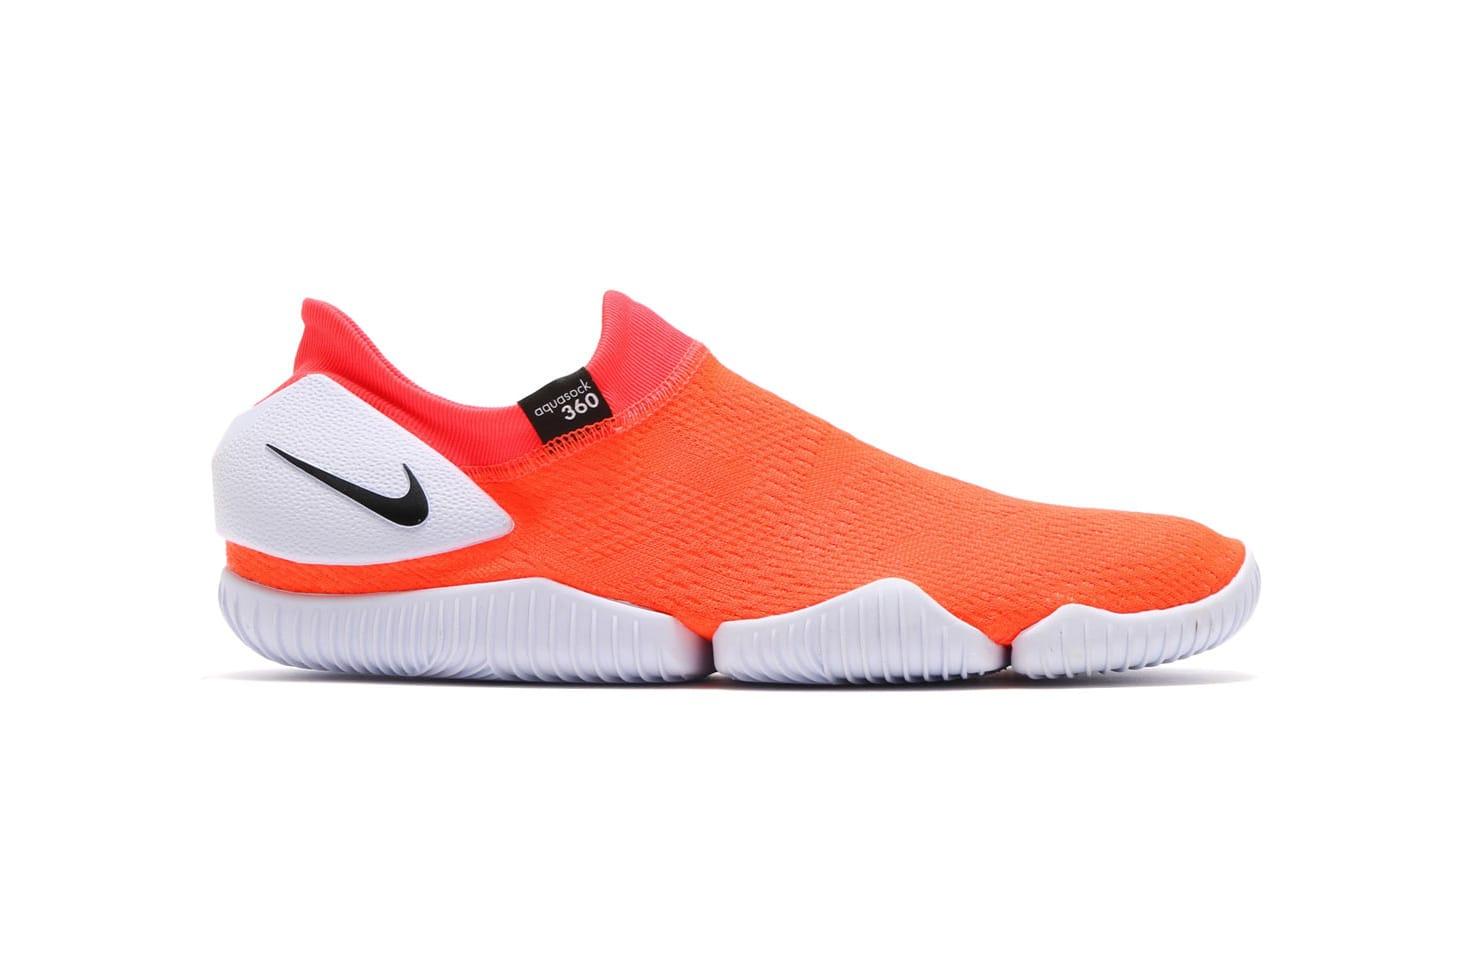 Nike Aqua Sock 360 | HYPEBEAST